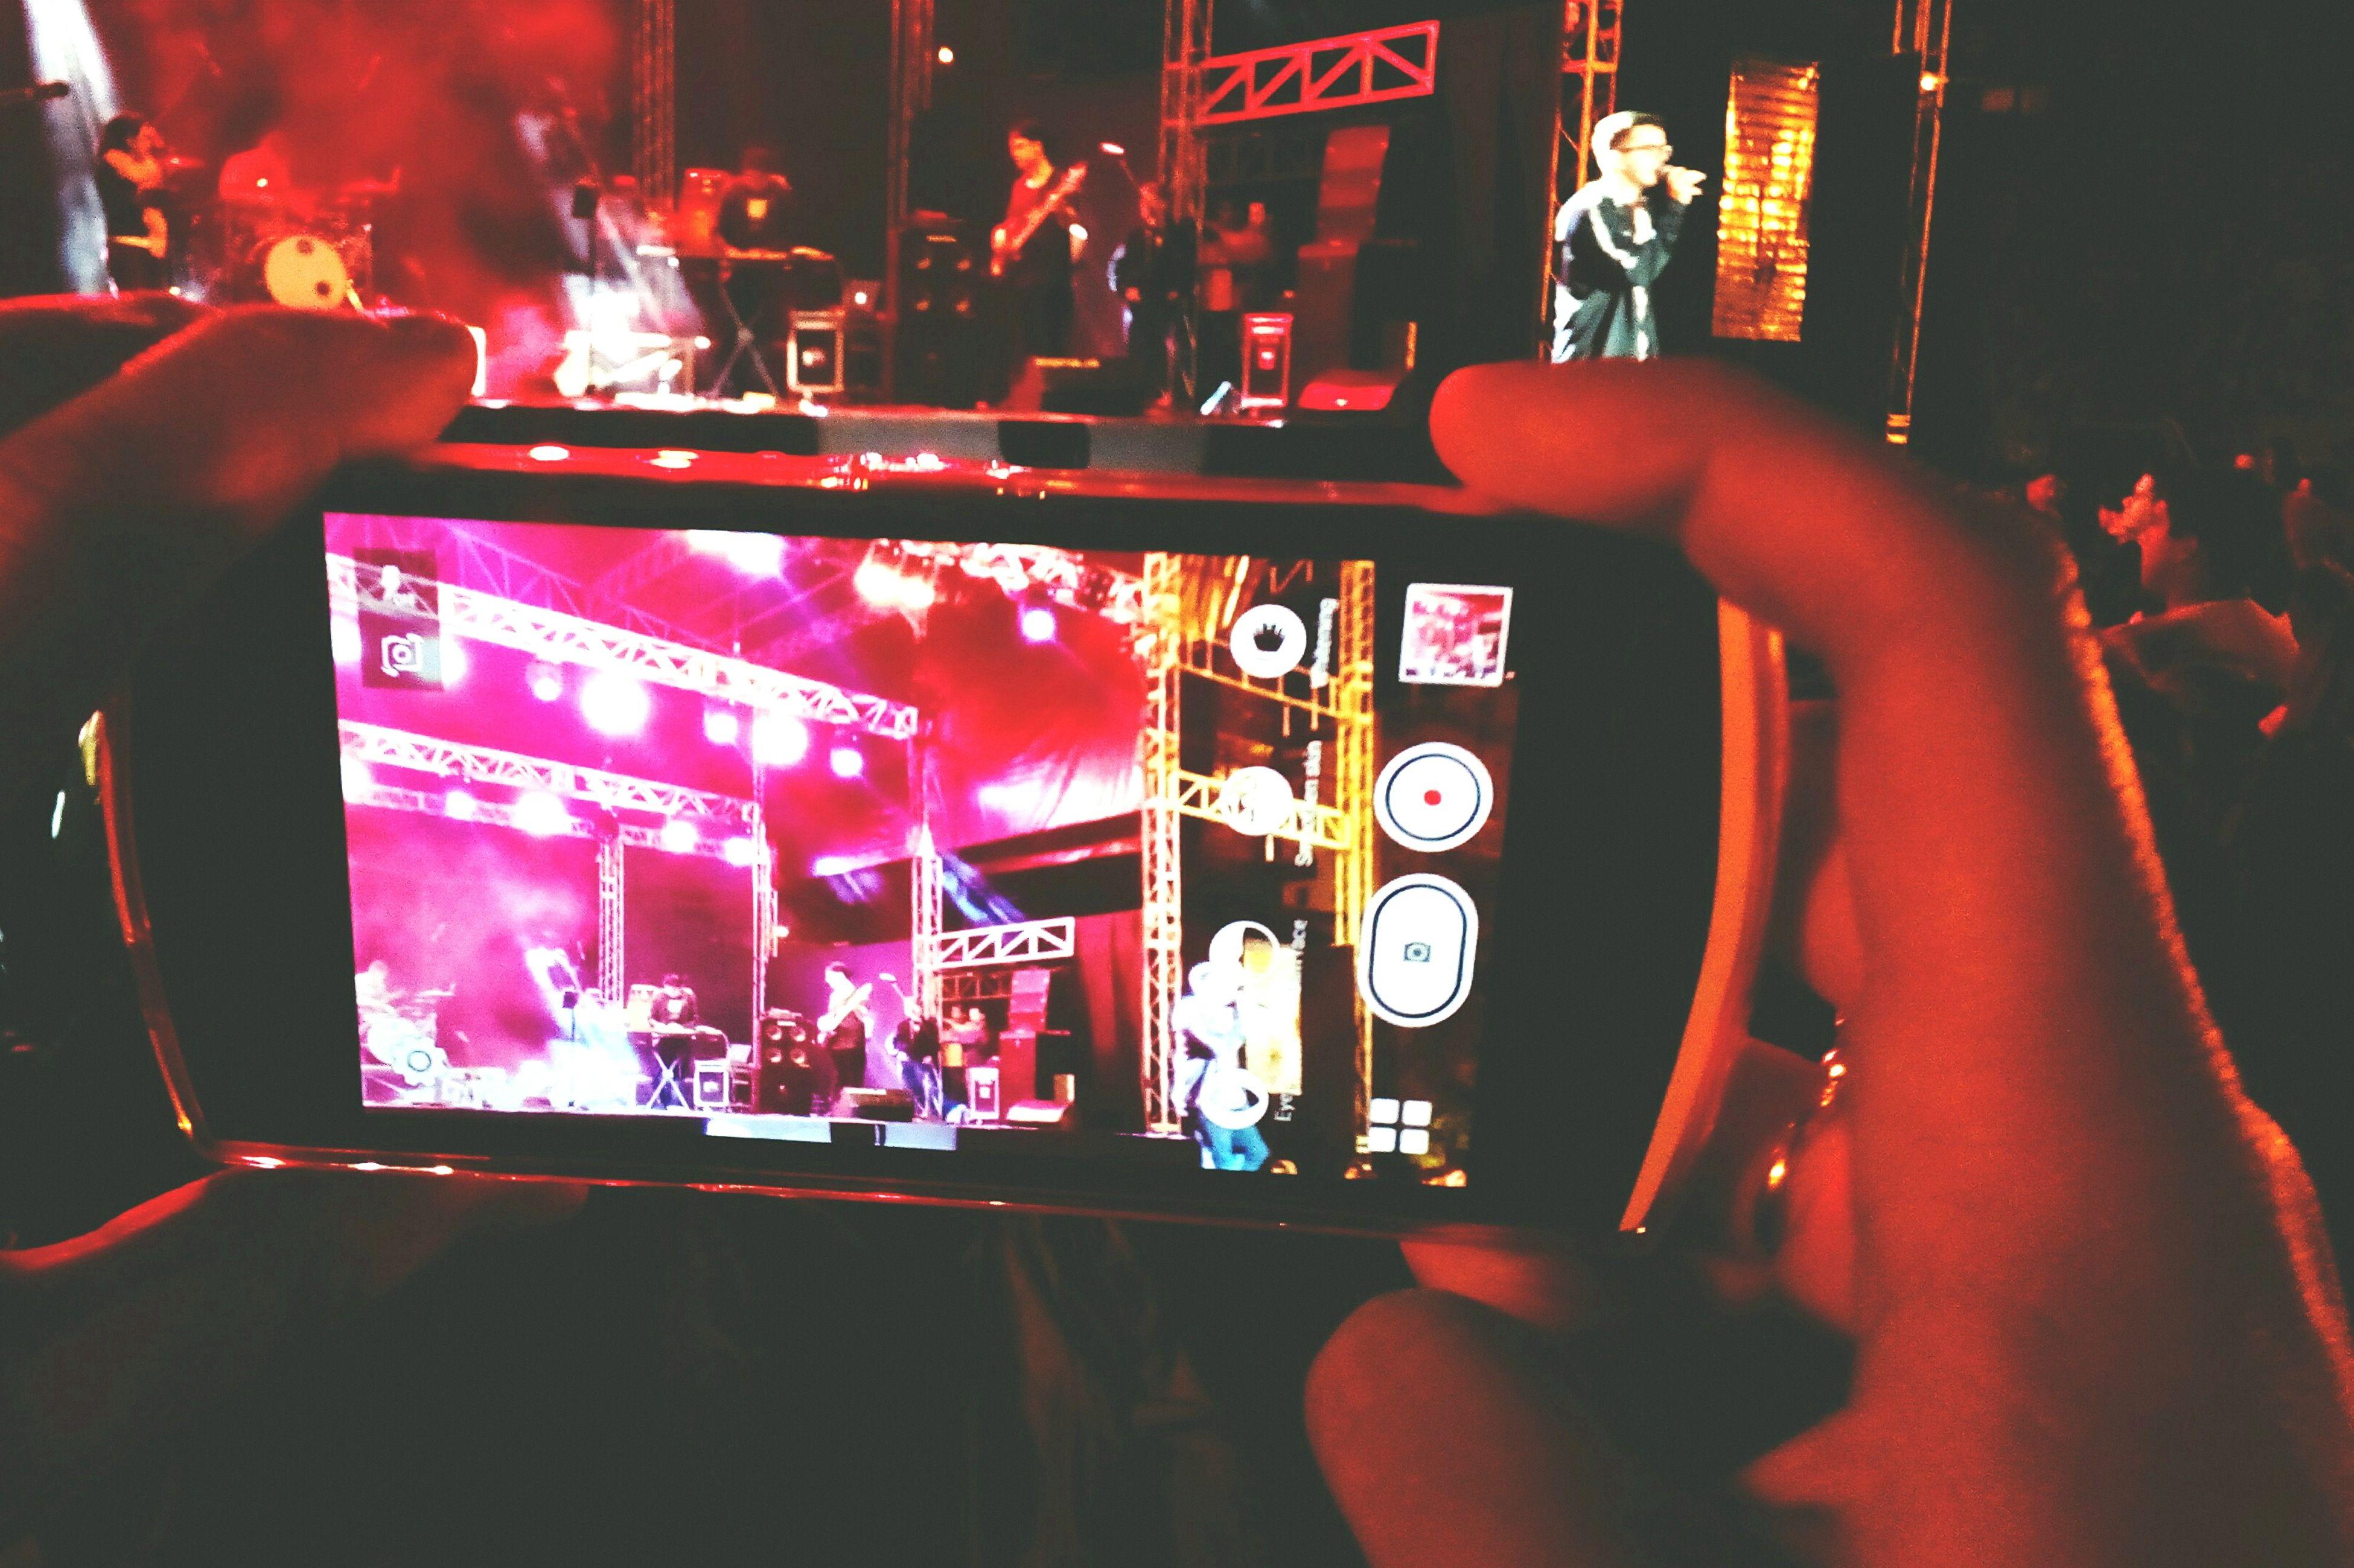 Concert EyemMusic EyemUrban Bestoftheday Eyembestshots Red Music Style Expression Expressthemusic